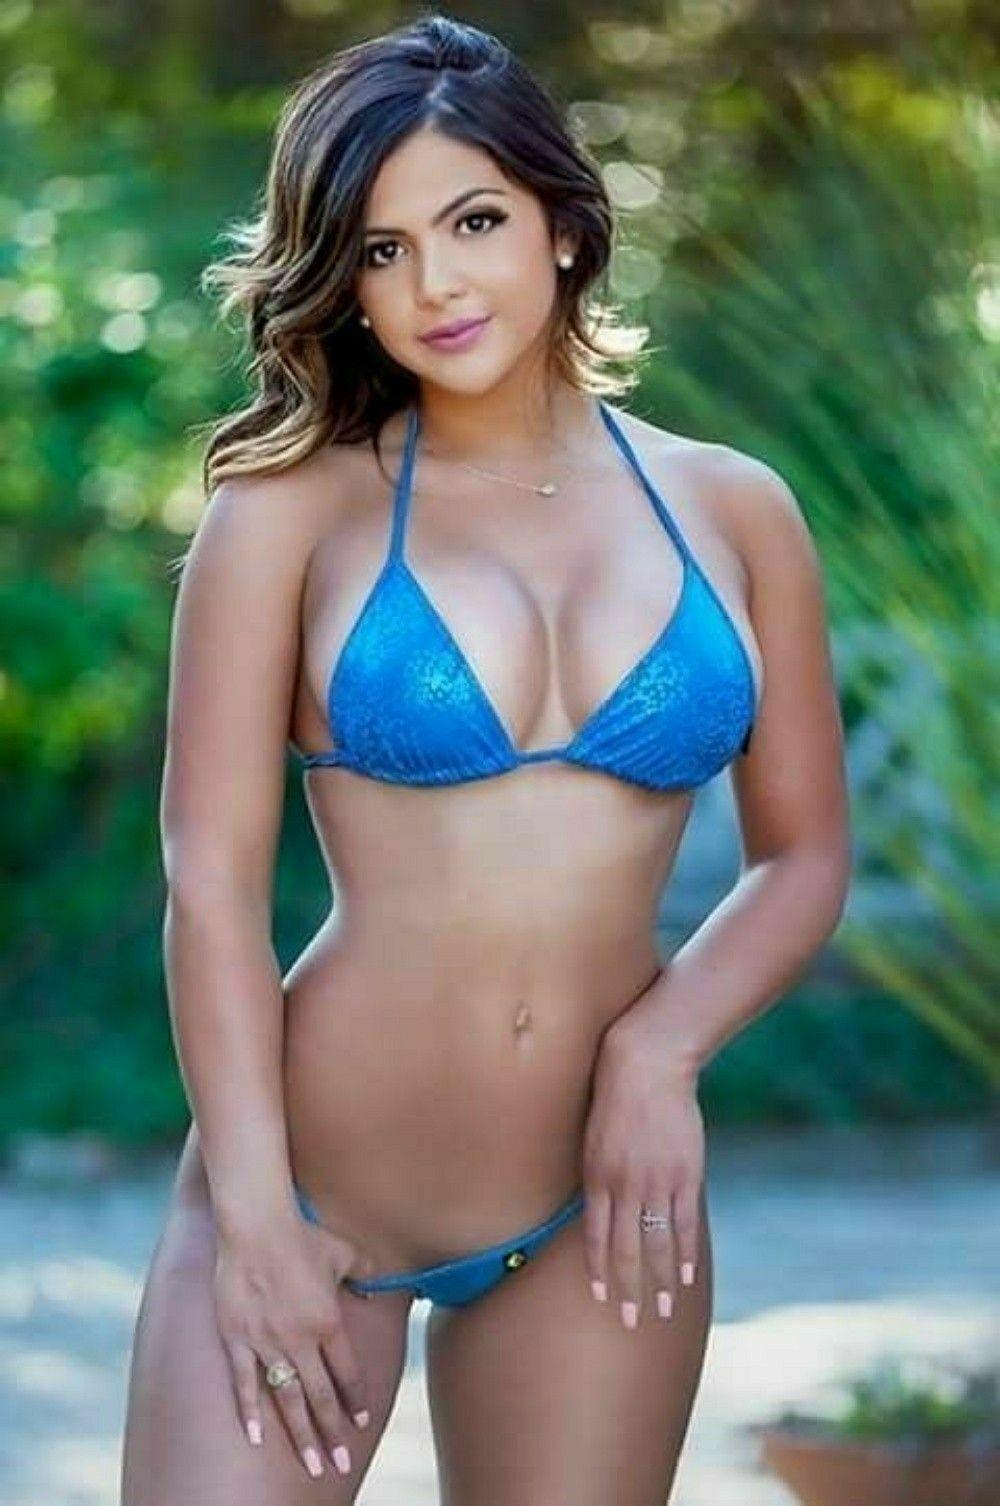 Pin by Ron VanHooser on Buxom Beauties 6 in 2019   Bikinis, Bikini girls,  Sexy bikini ca8a91a0a6